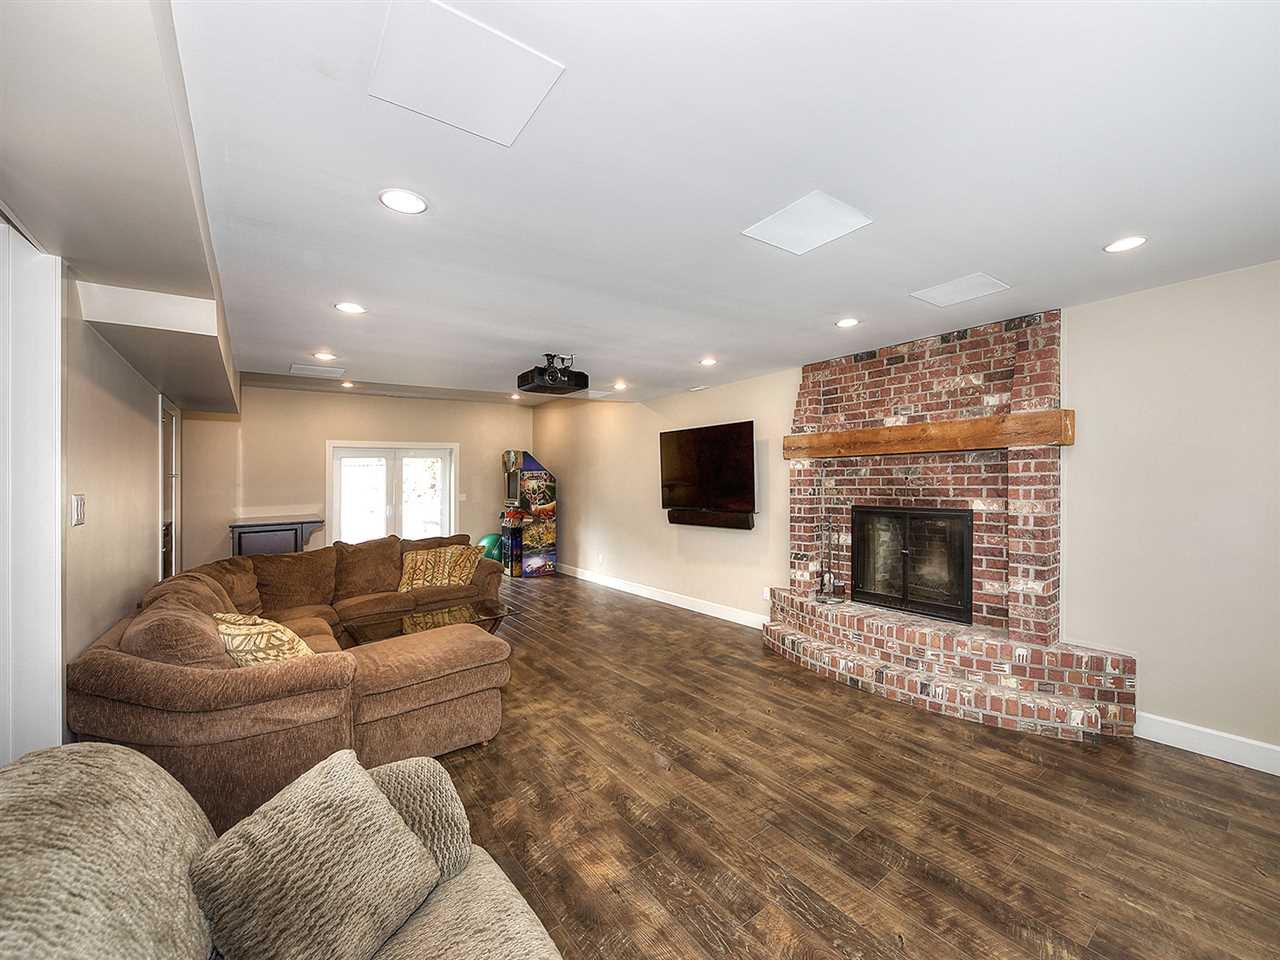 Photo 13: Photos: 1067 WILMINGTON Drive in Delta: Tsawwassen Central House for sale (Tsawwassen)  : MLS®# R2090180